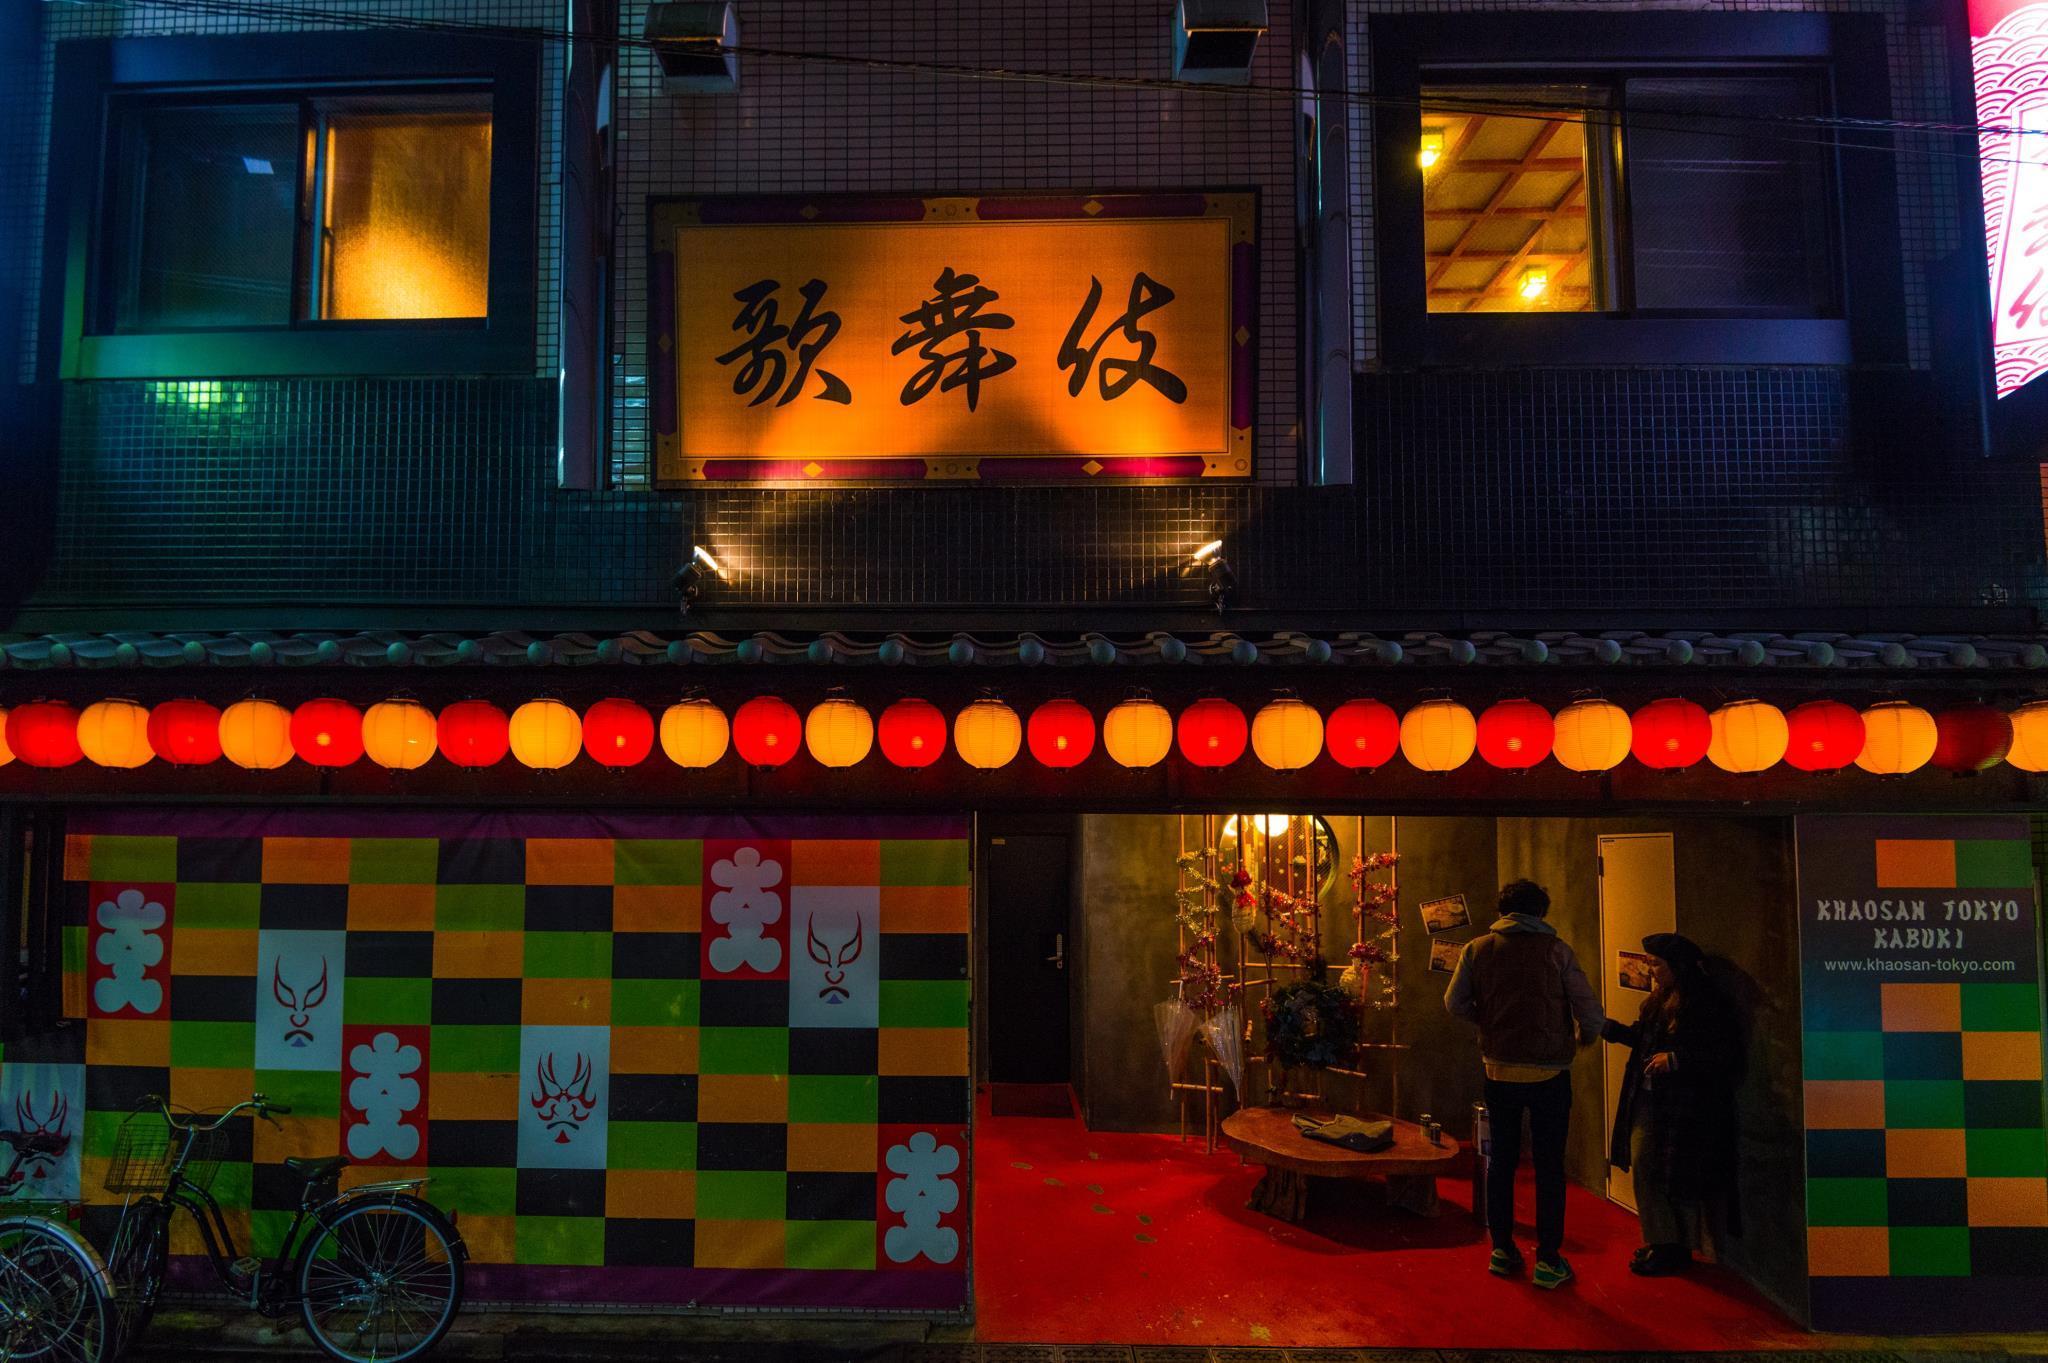 Khaosan Tokyo Kabuki 1